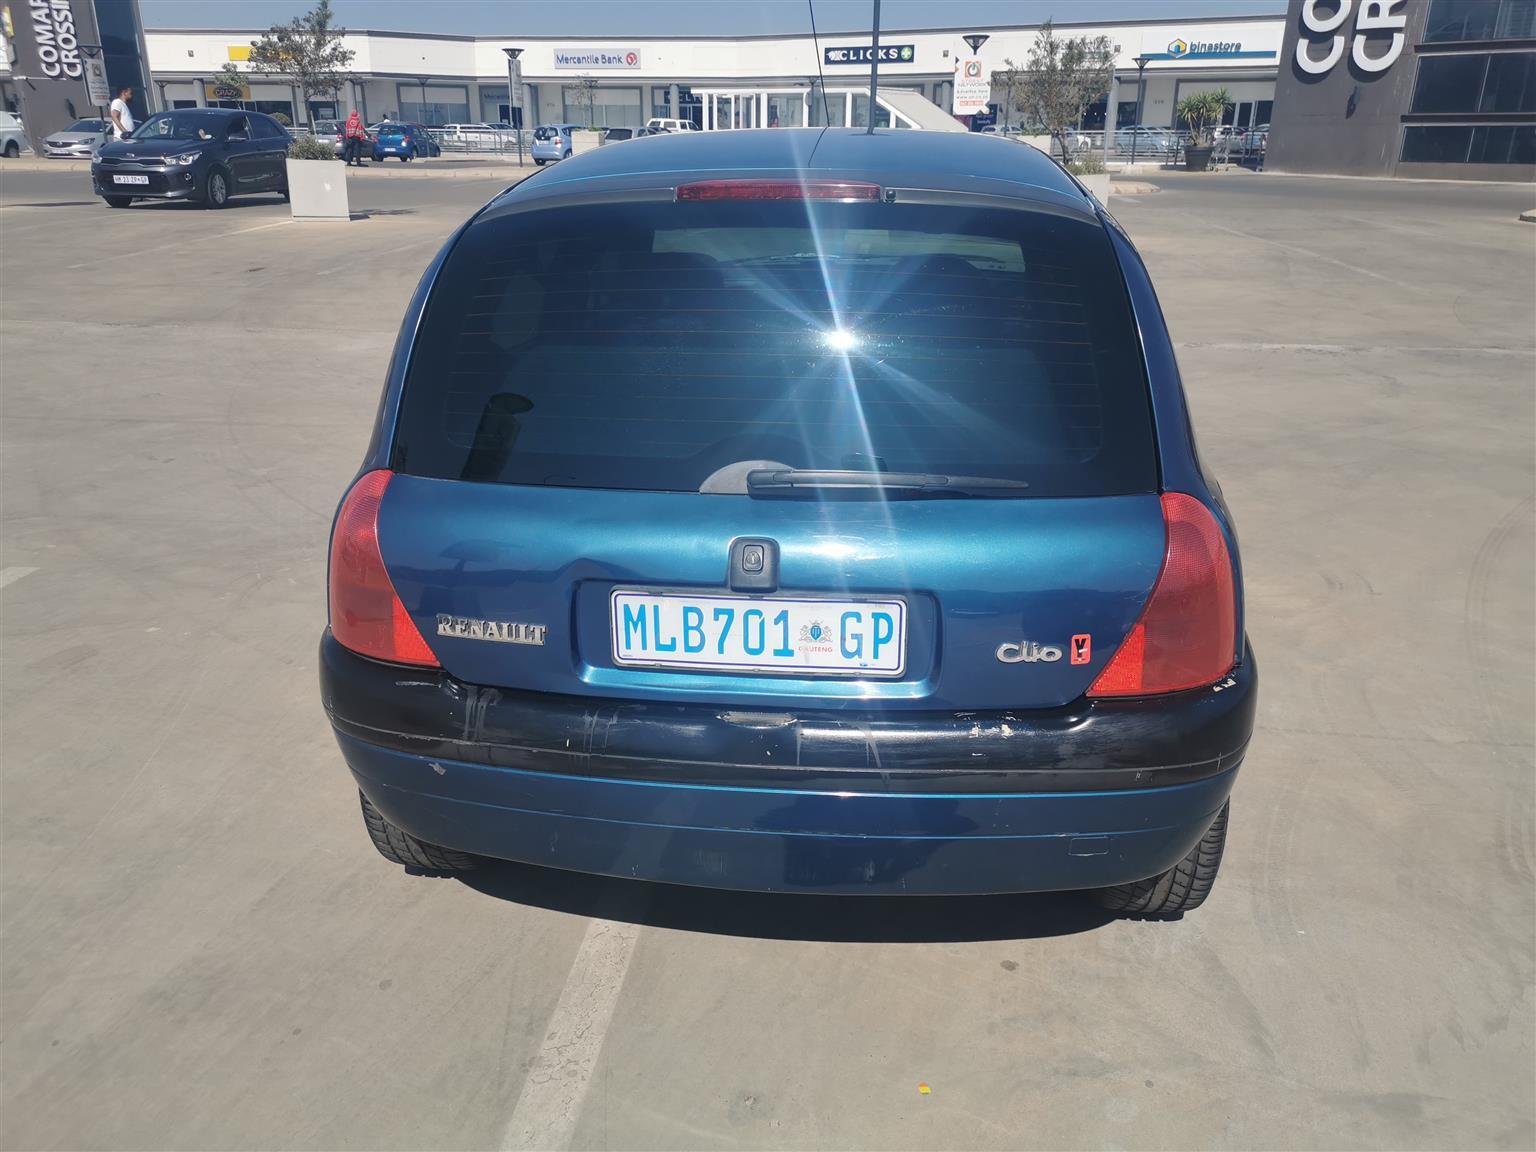 2001 Renault Clio 1.4 Expression 5 door